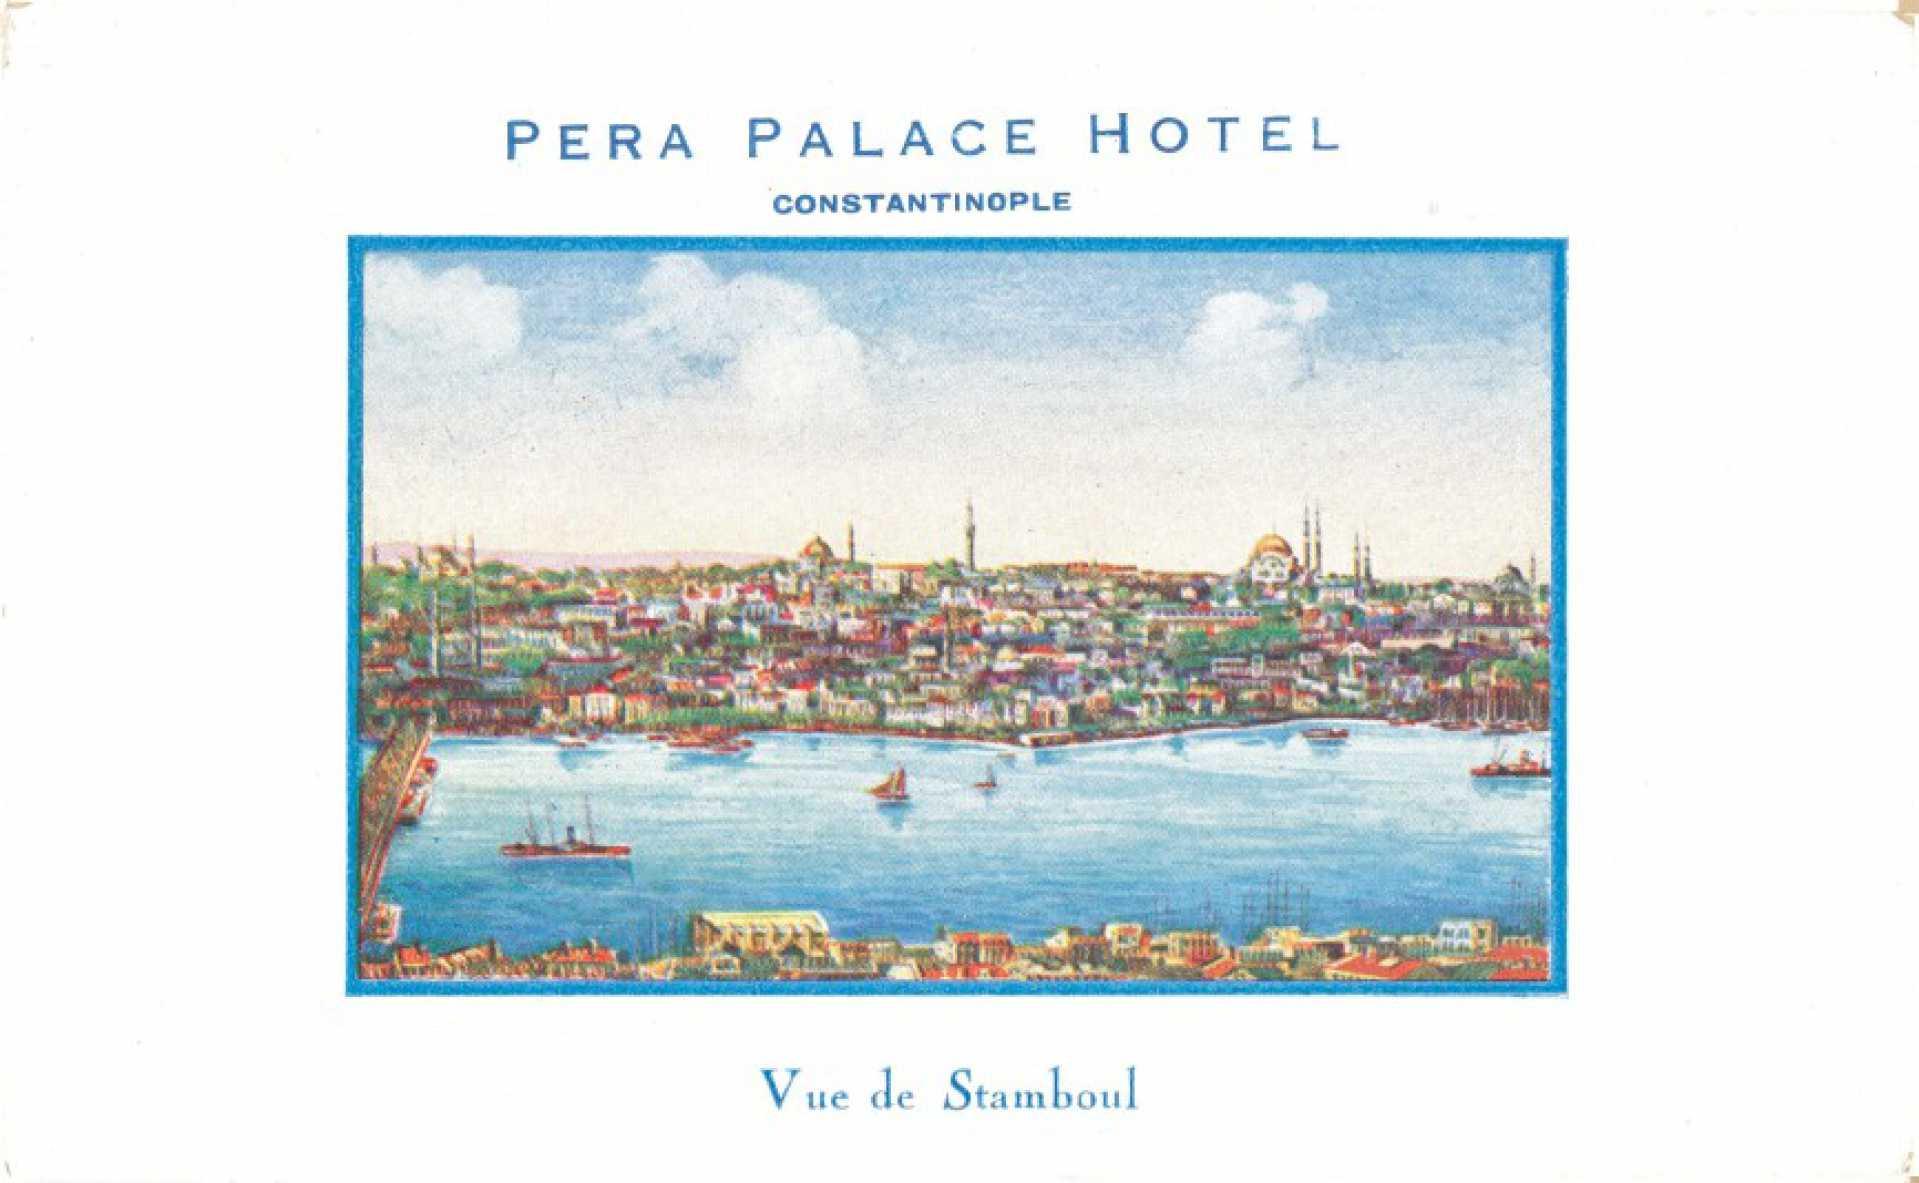 Pera Palace Hotel. Vue de Stamboul